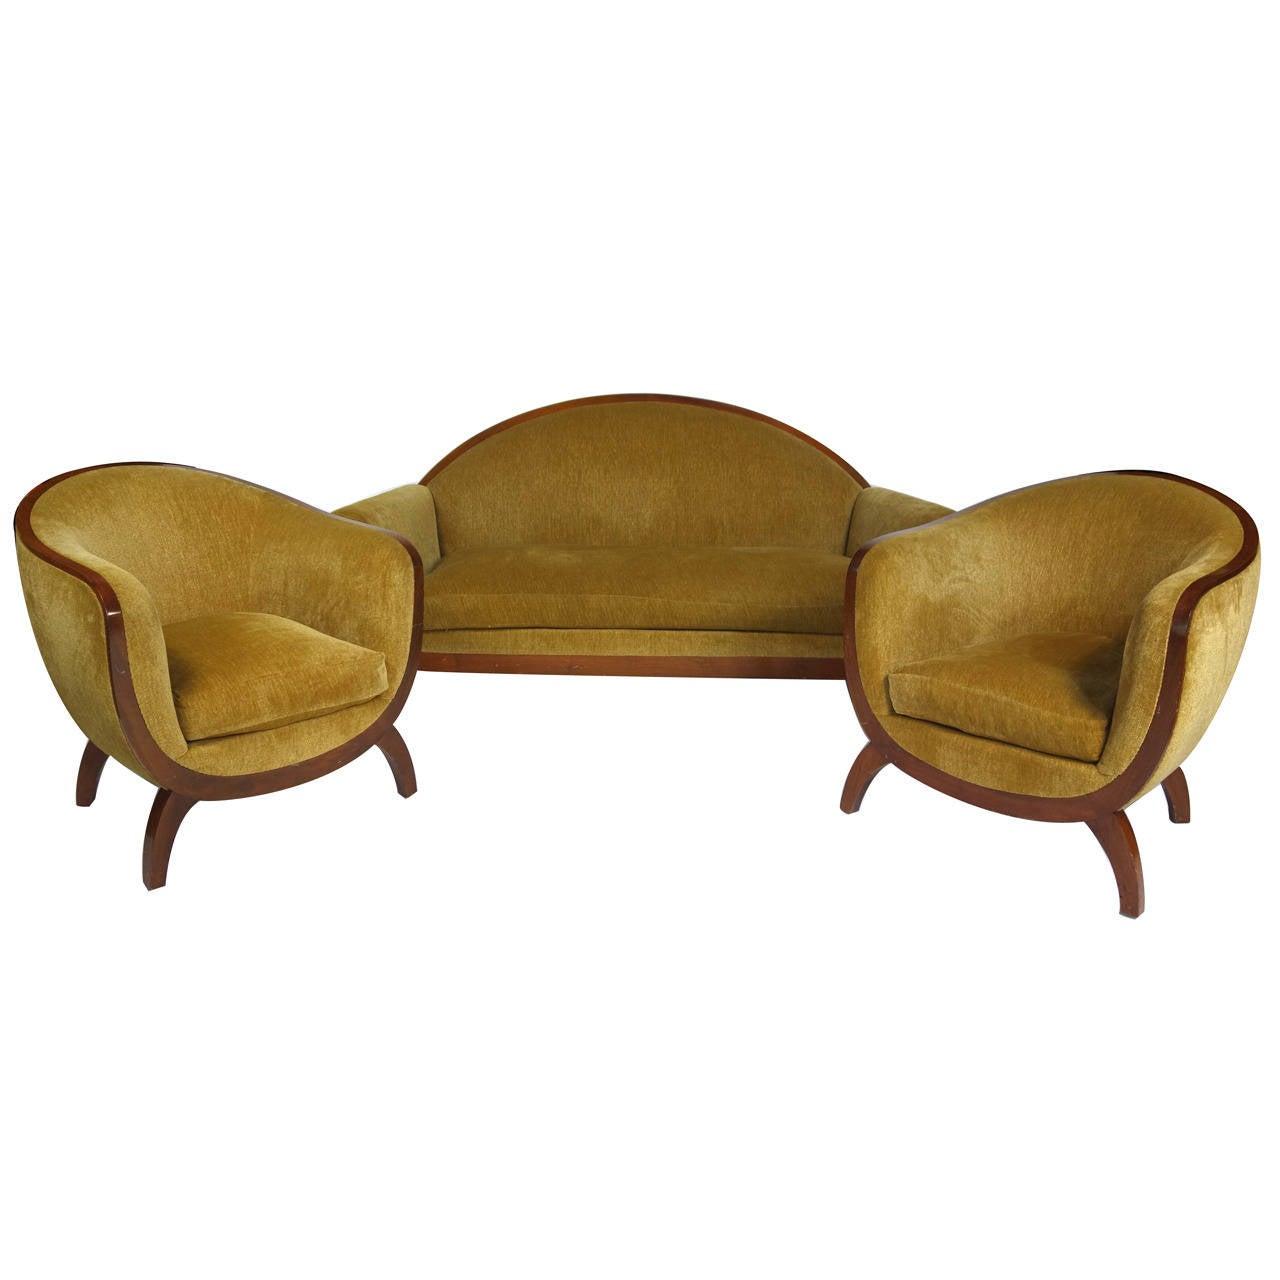 Rare Art Deco Three Piece Salon Suite By Lucie Renaudot